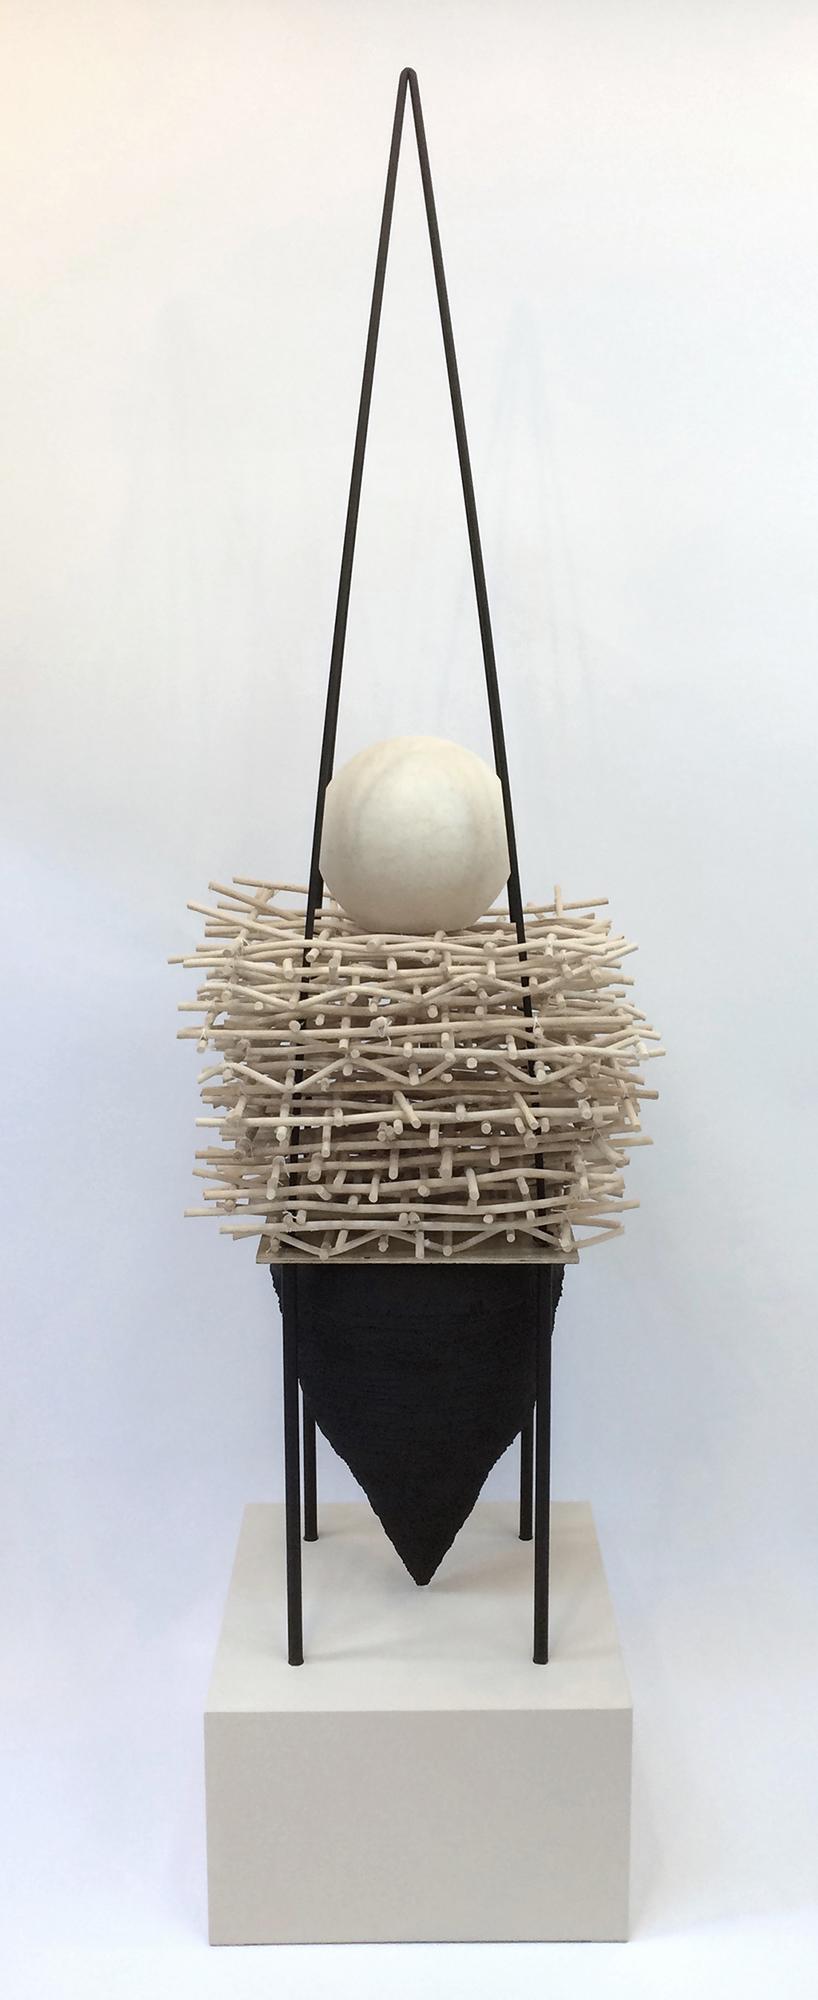 Nesting : Hold